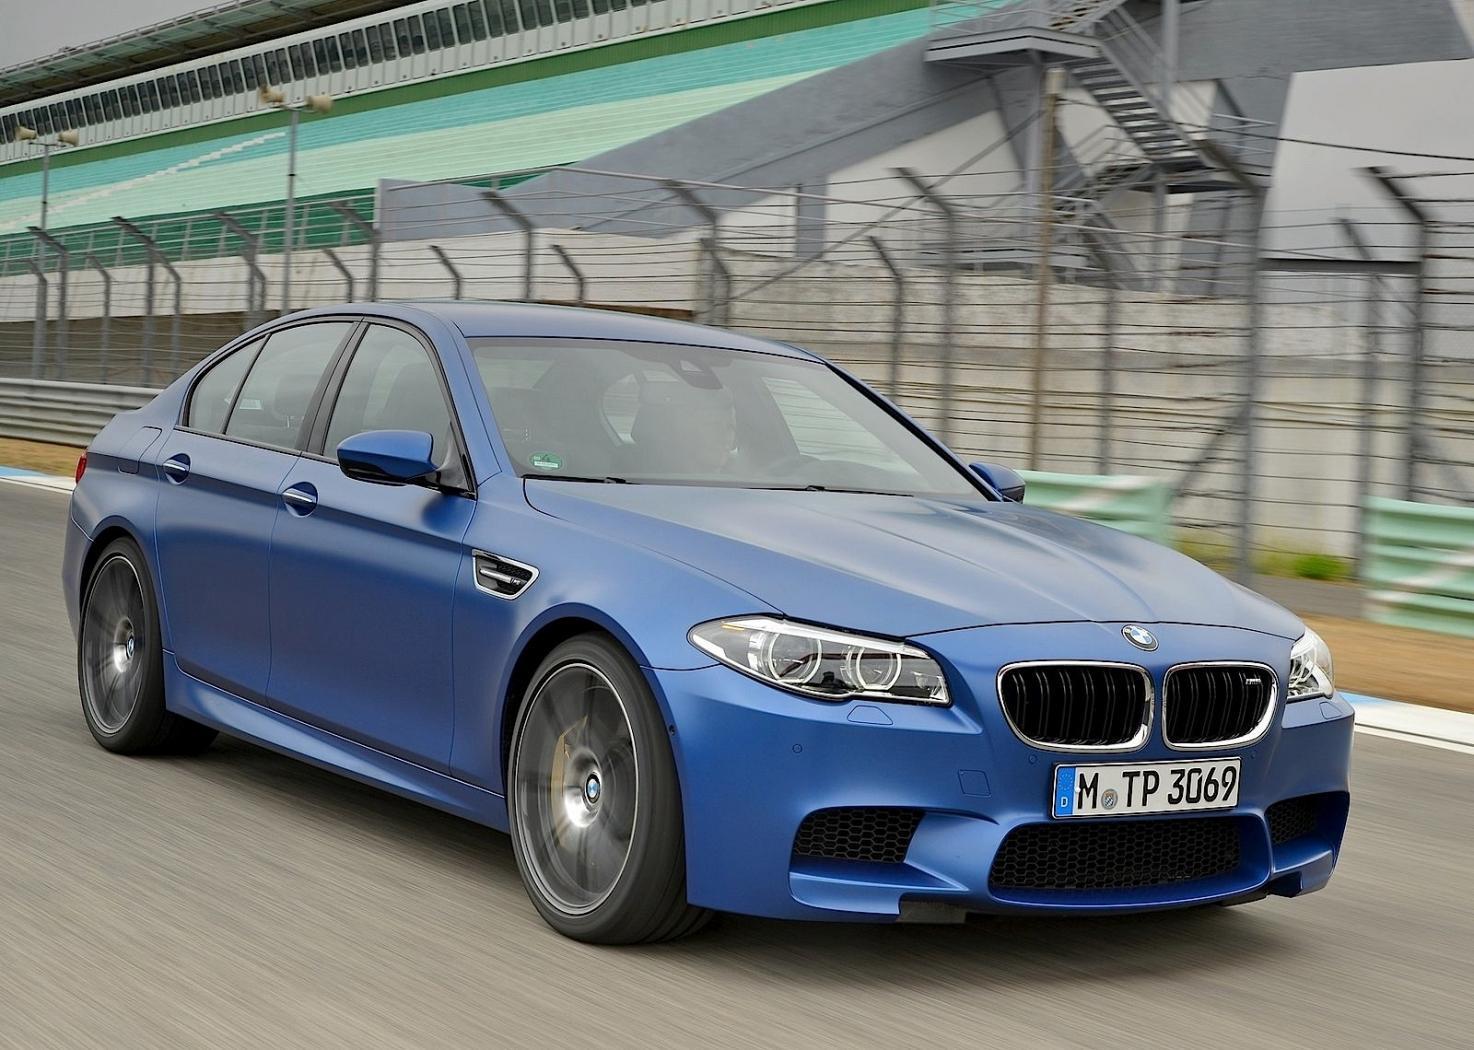 Fiche-occasion-BMW-M5-F10-1.jpeg